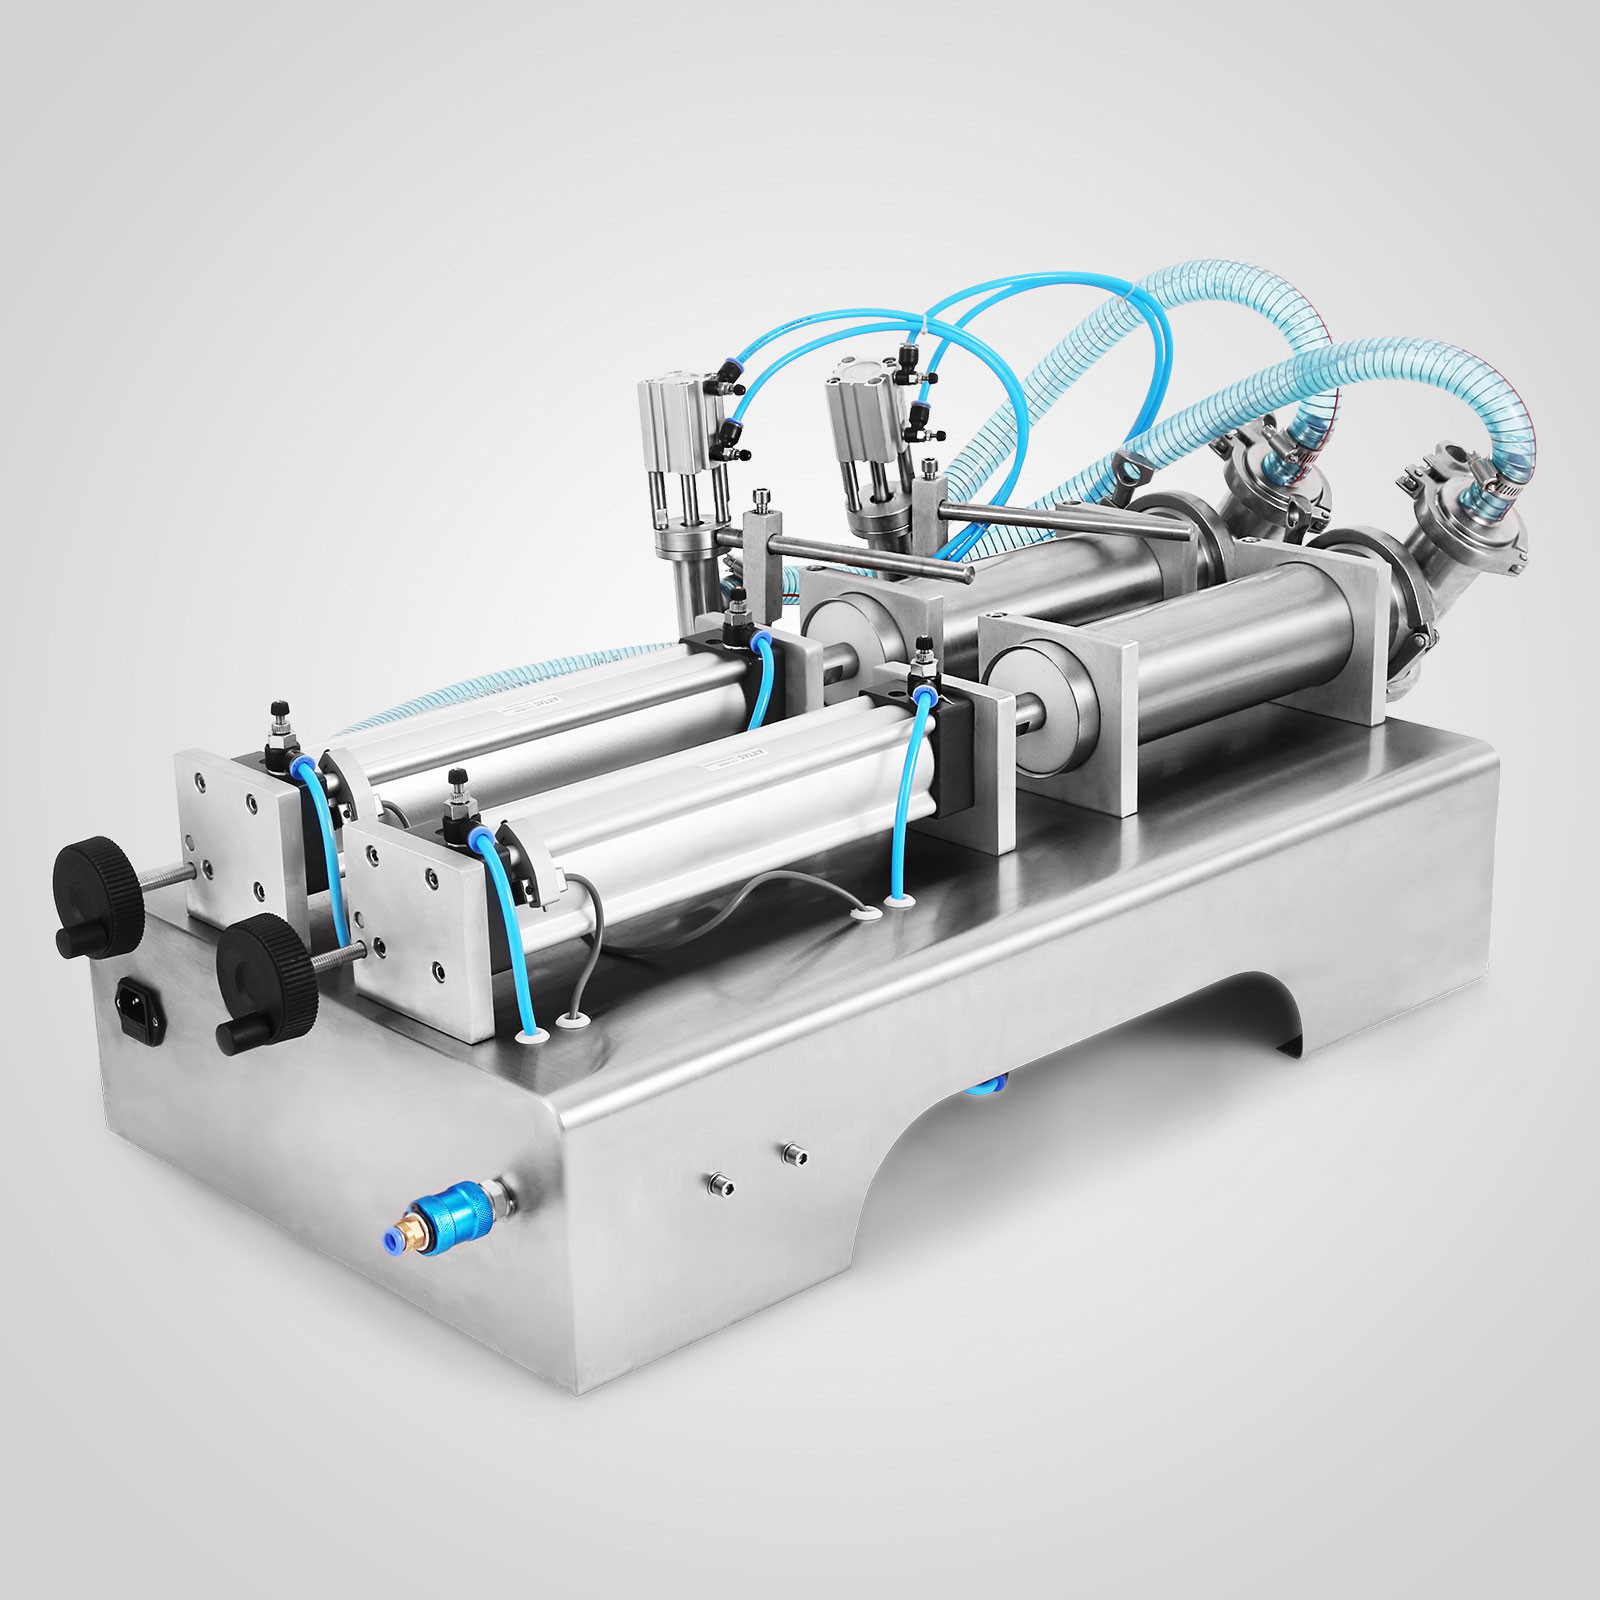 Liquid-Filling-Machine-Filler-Remplissage-2-3500ML-50-500ML-INDUSTRY-SUPPLY miniature 78